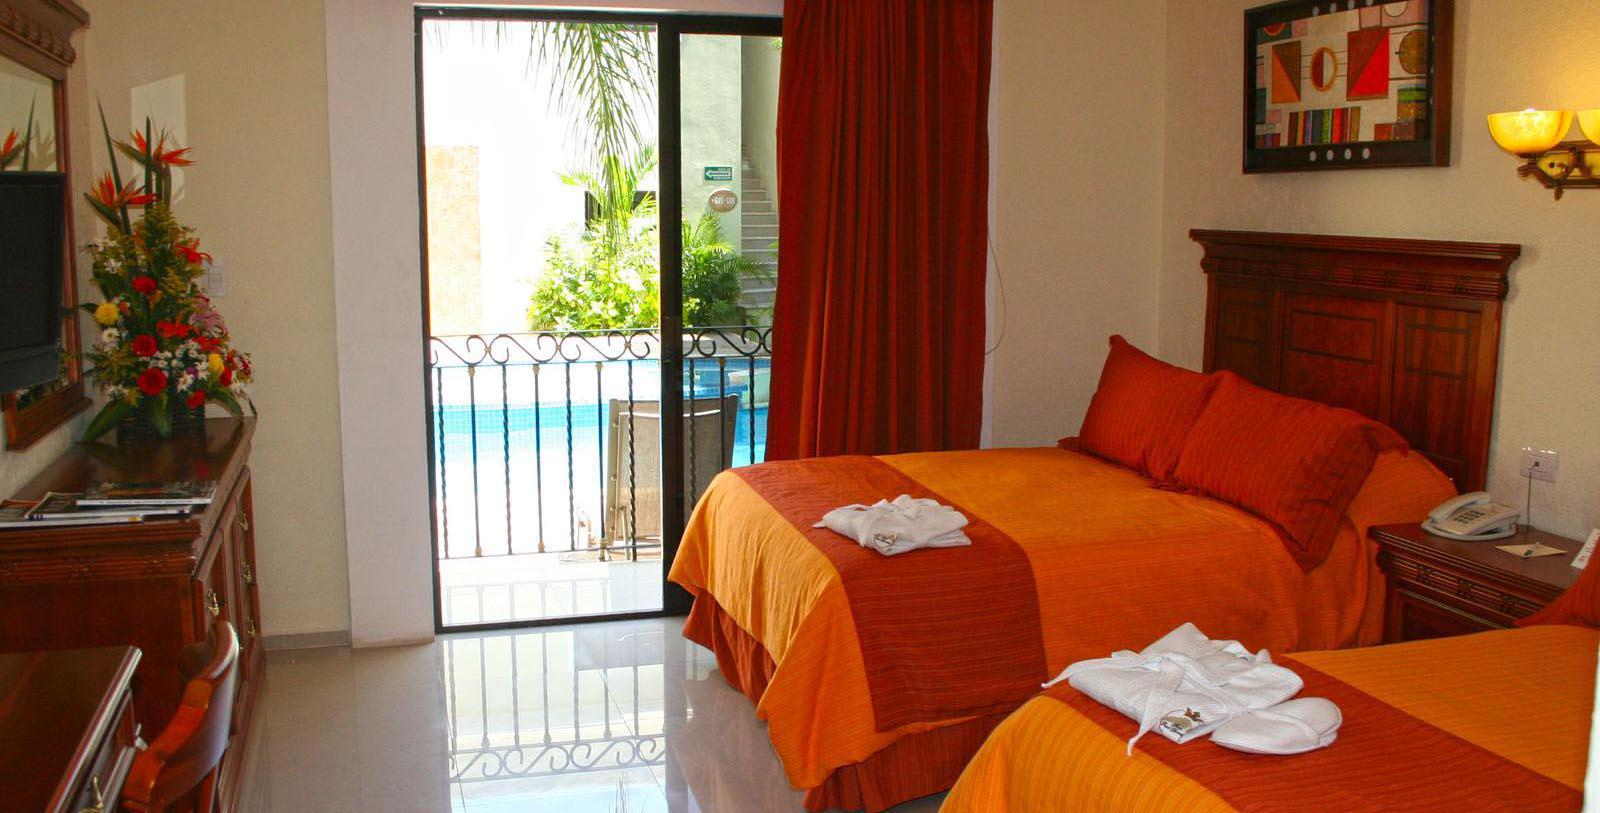 Image of Guestroom Interior, Gran Real Yucatan, Merida, Mexico, 1800s, Member of Historic Hotels Worldwide, Accommodations